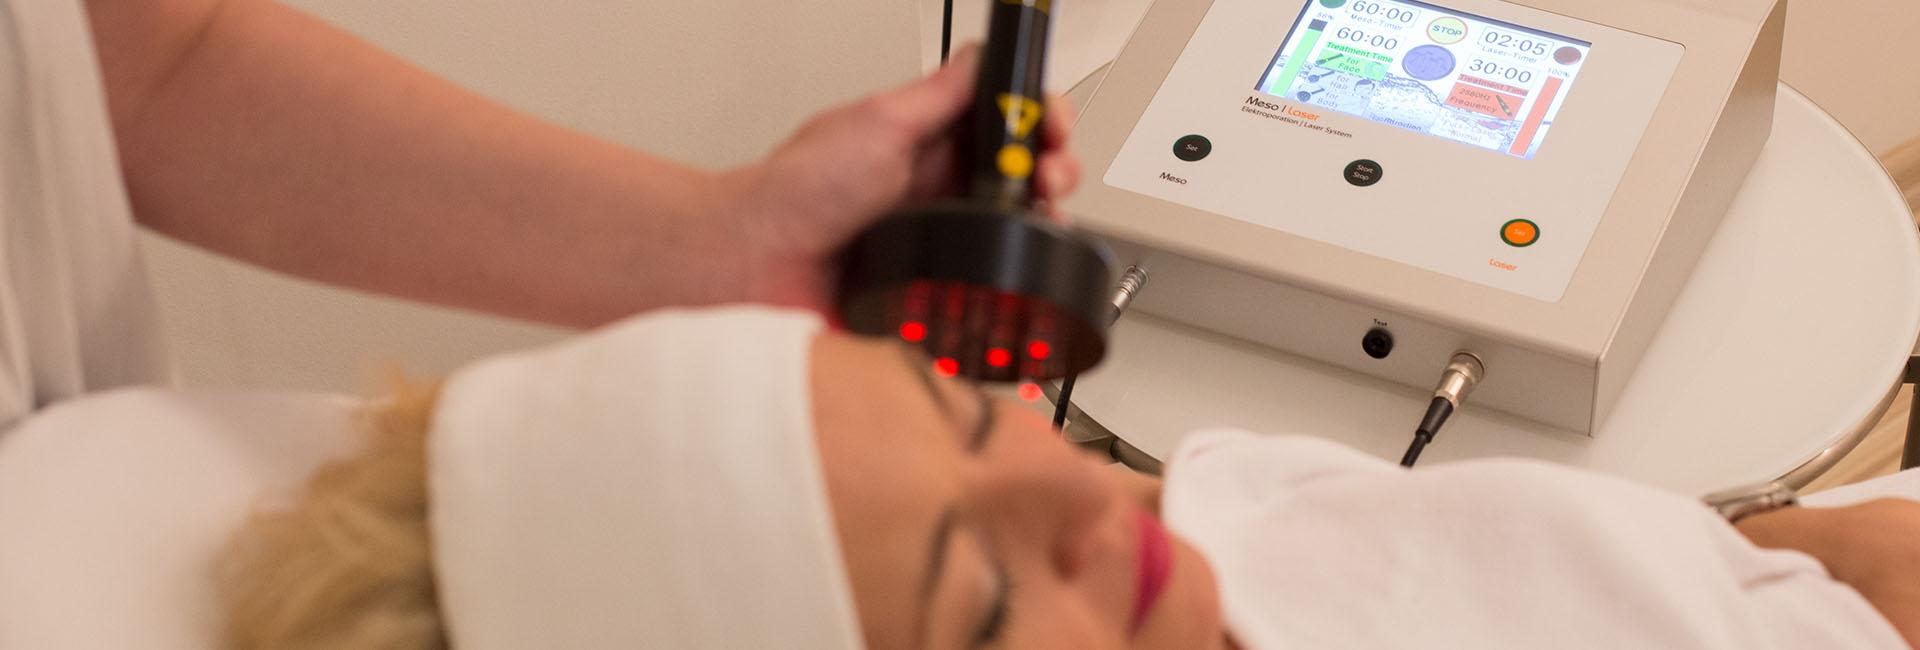 Lézeres mezoterápia (Meso I Laser)